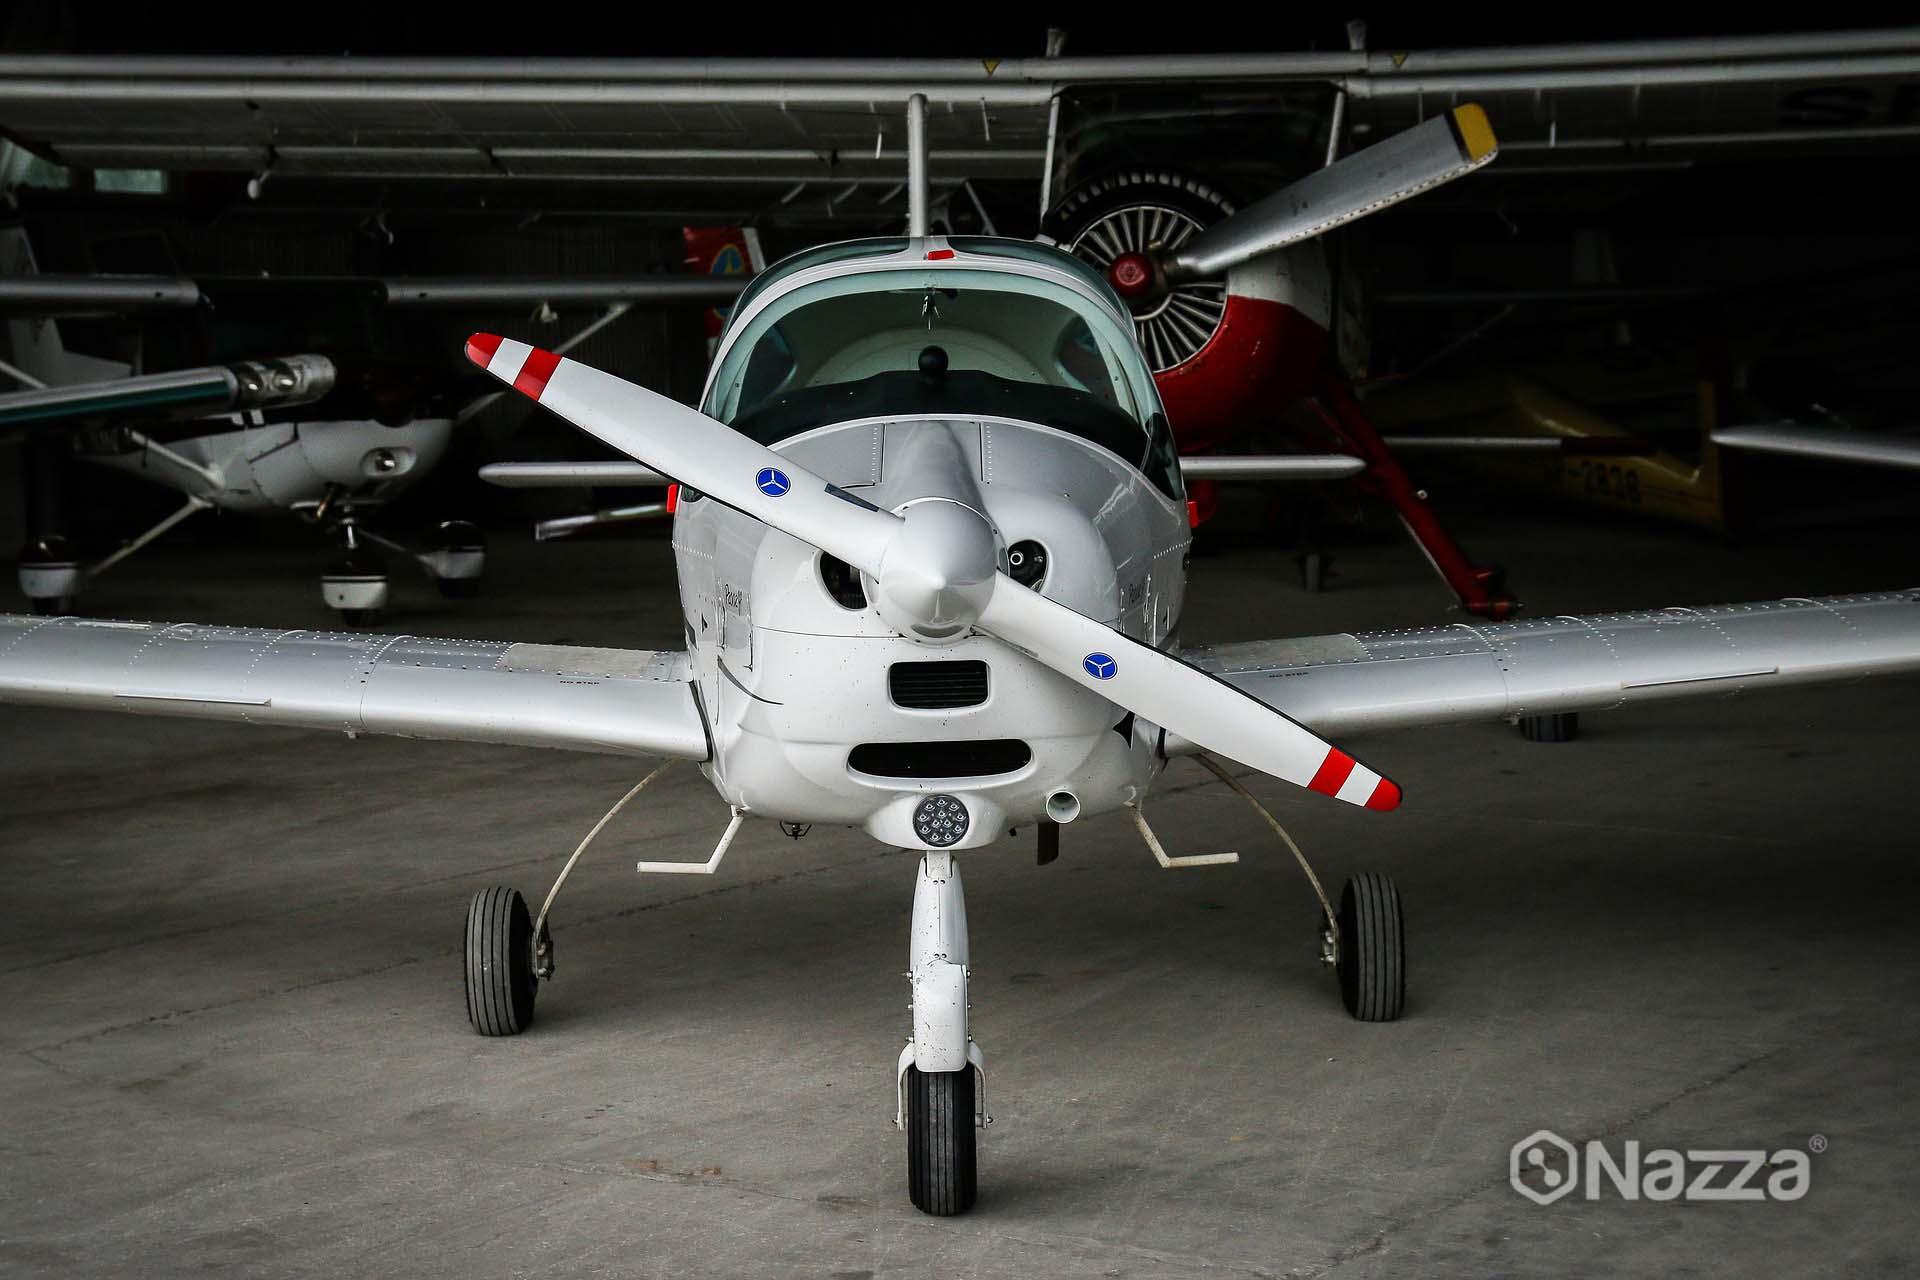 VIniléster para aviones Nazza